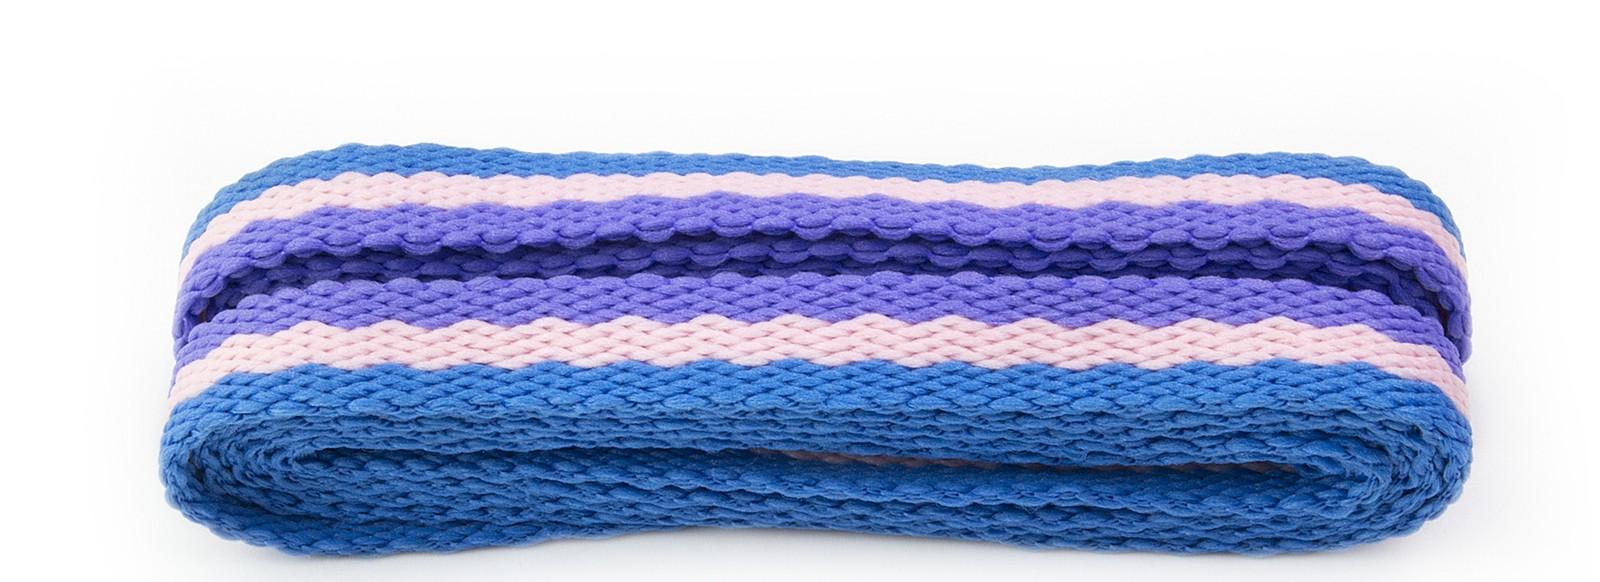 Sneaker Lilac/pink/blue Stripe